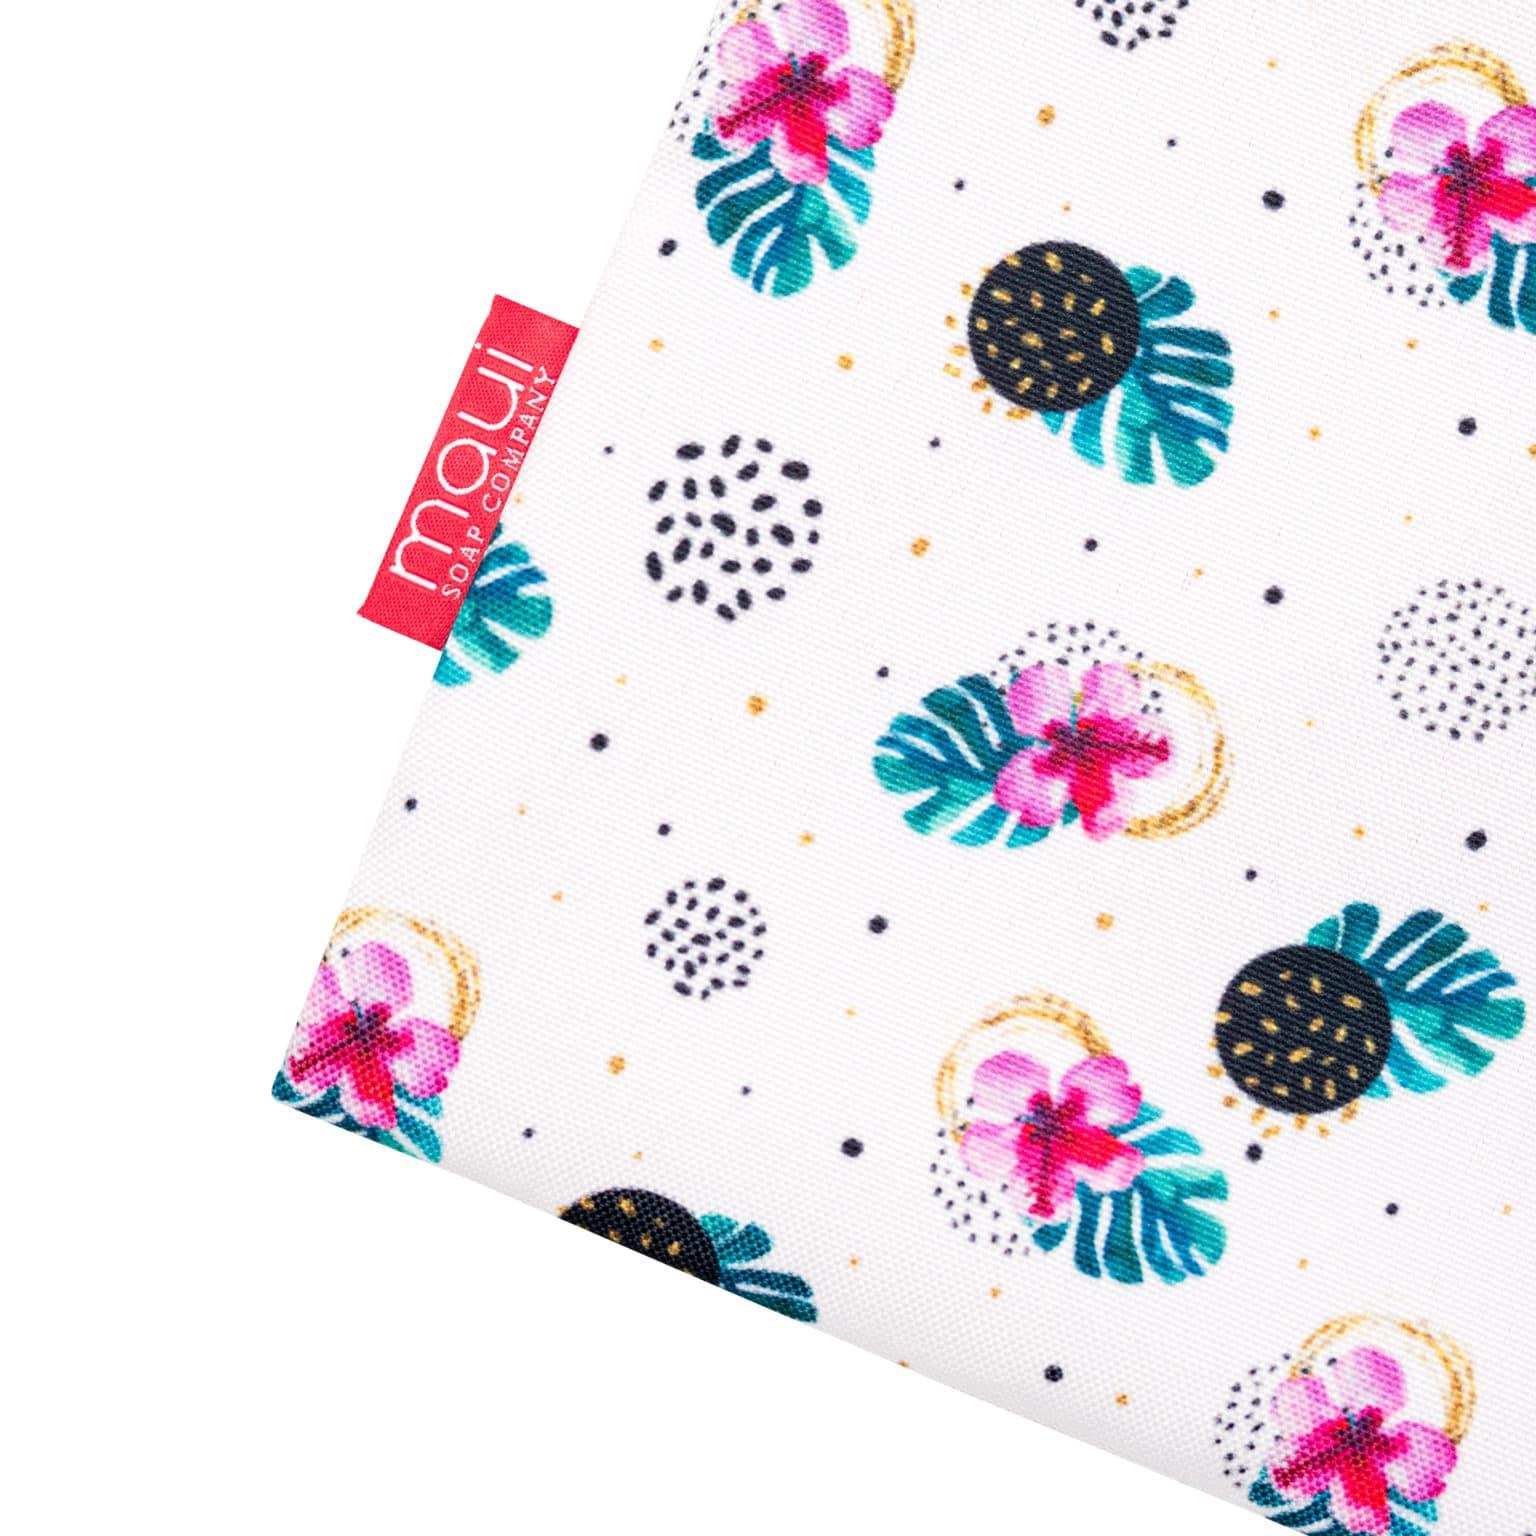 Aloha Hawaiian Pouch Bag - Hibiscus Dot Print Side